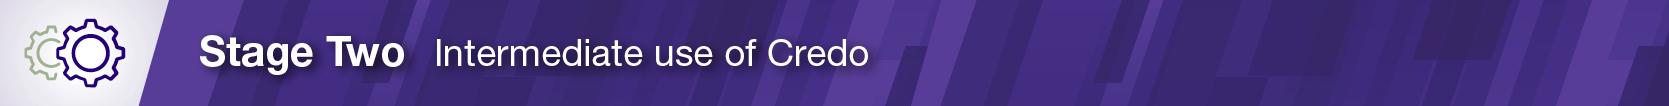 CredoInInstruction_SectionHead_801x51 Stage2_v2 (1)